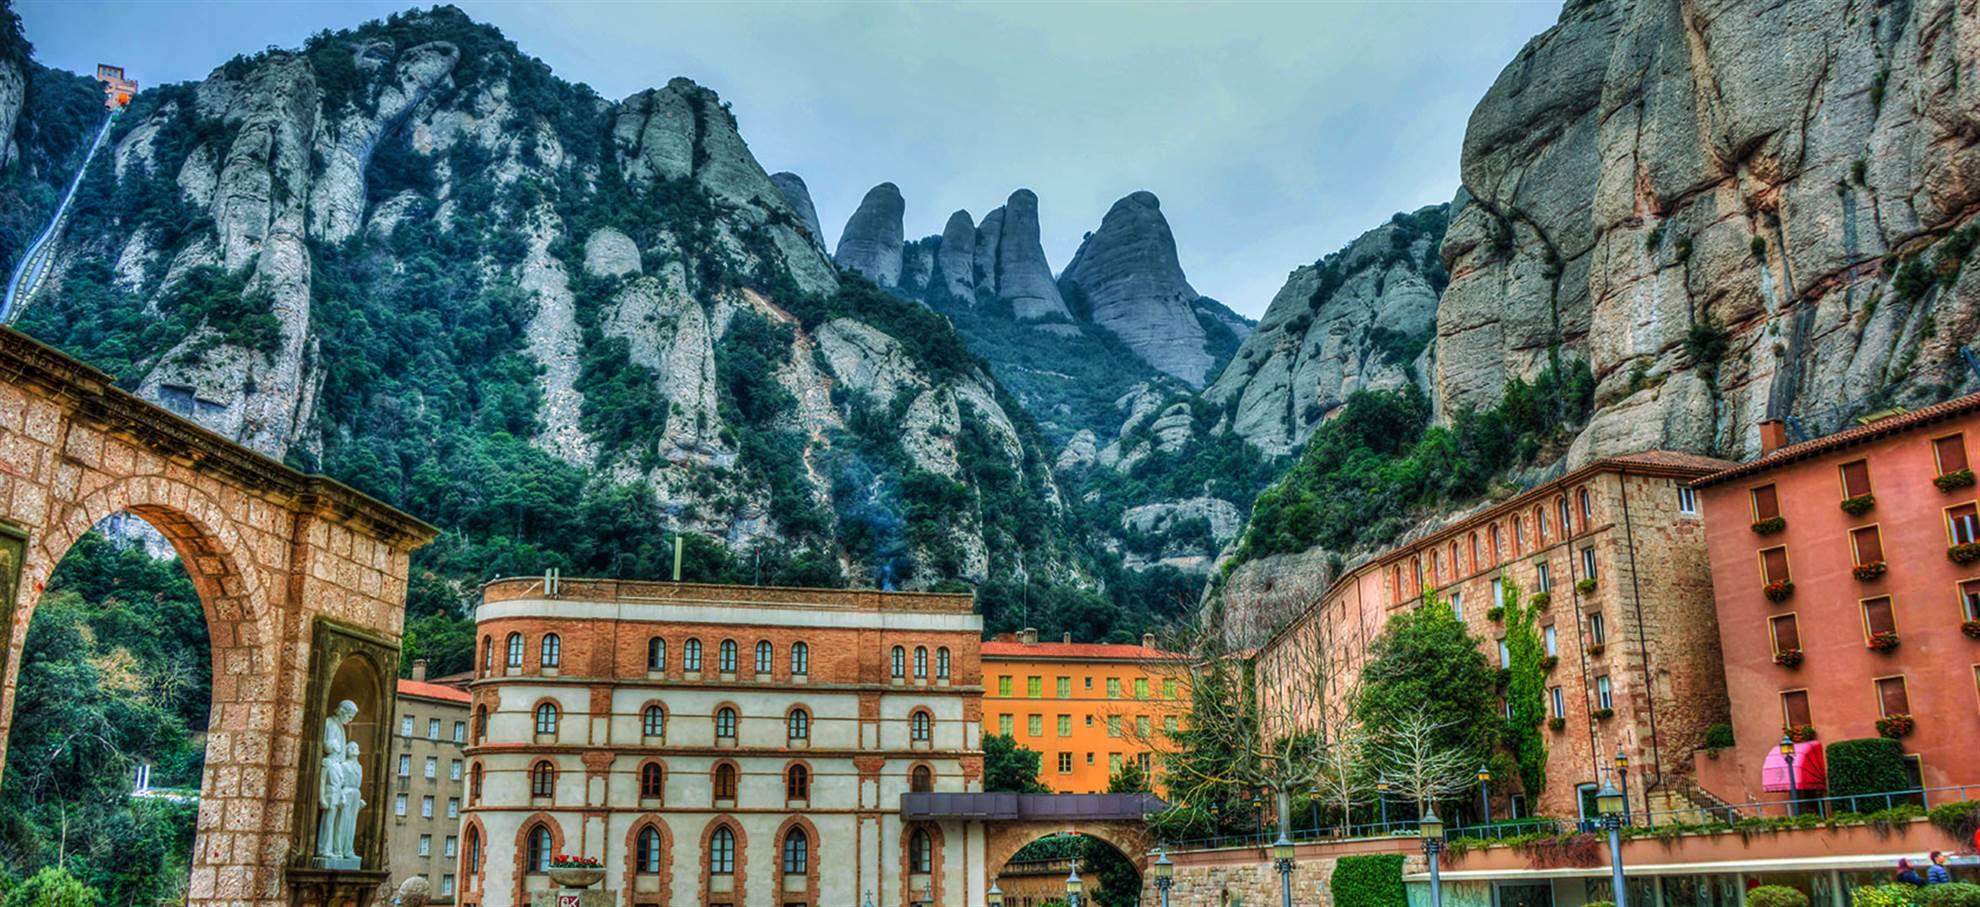 Montserrat & Gaudis krypta